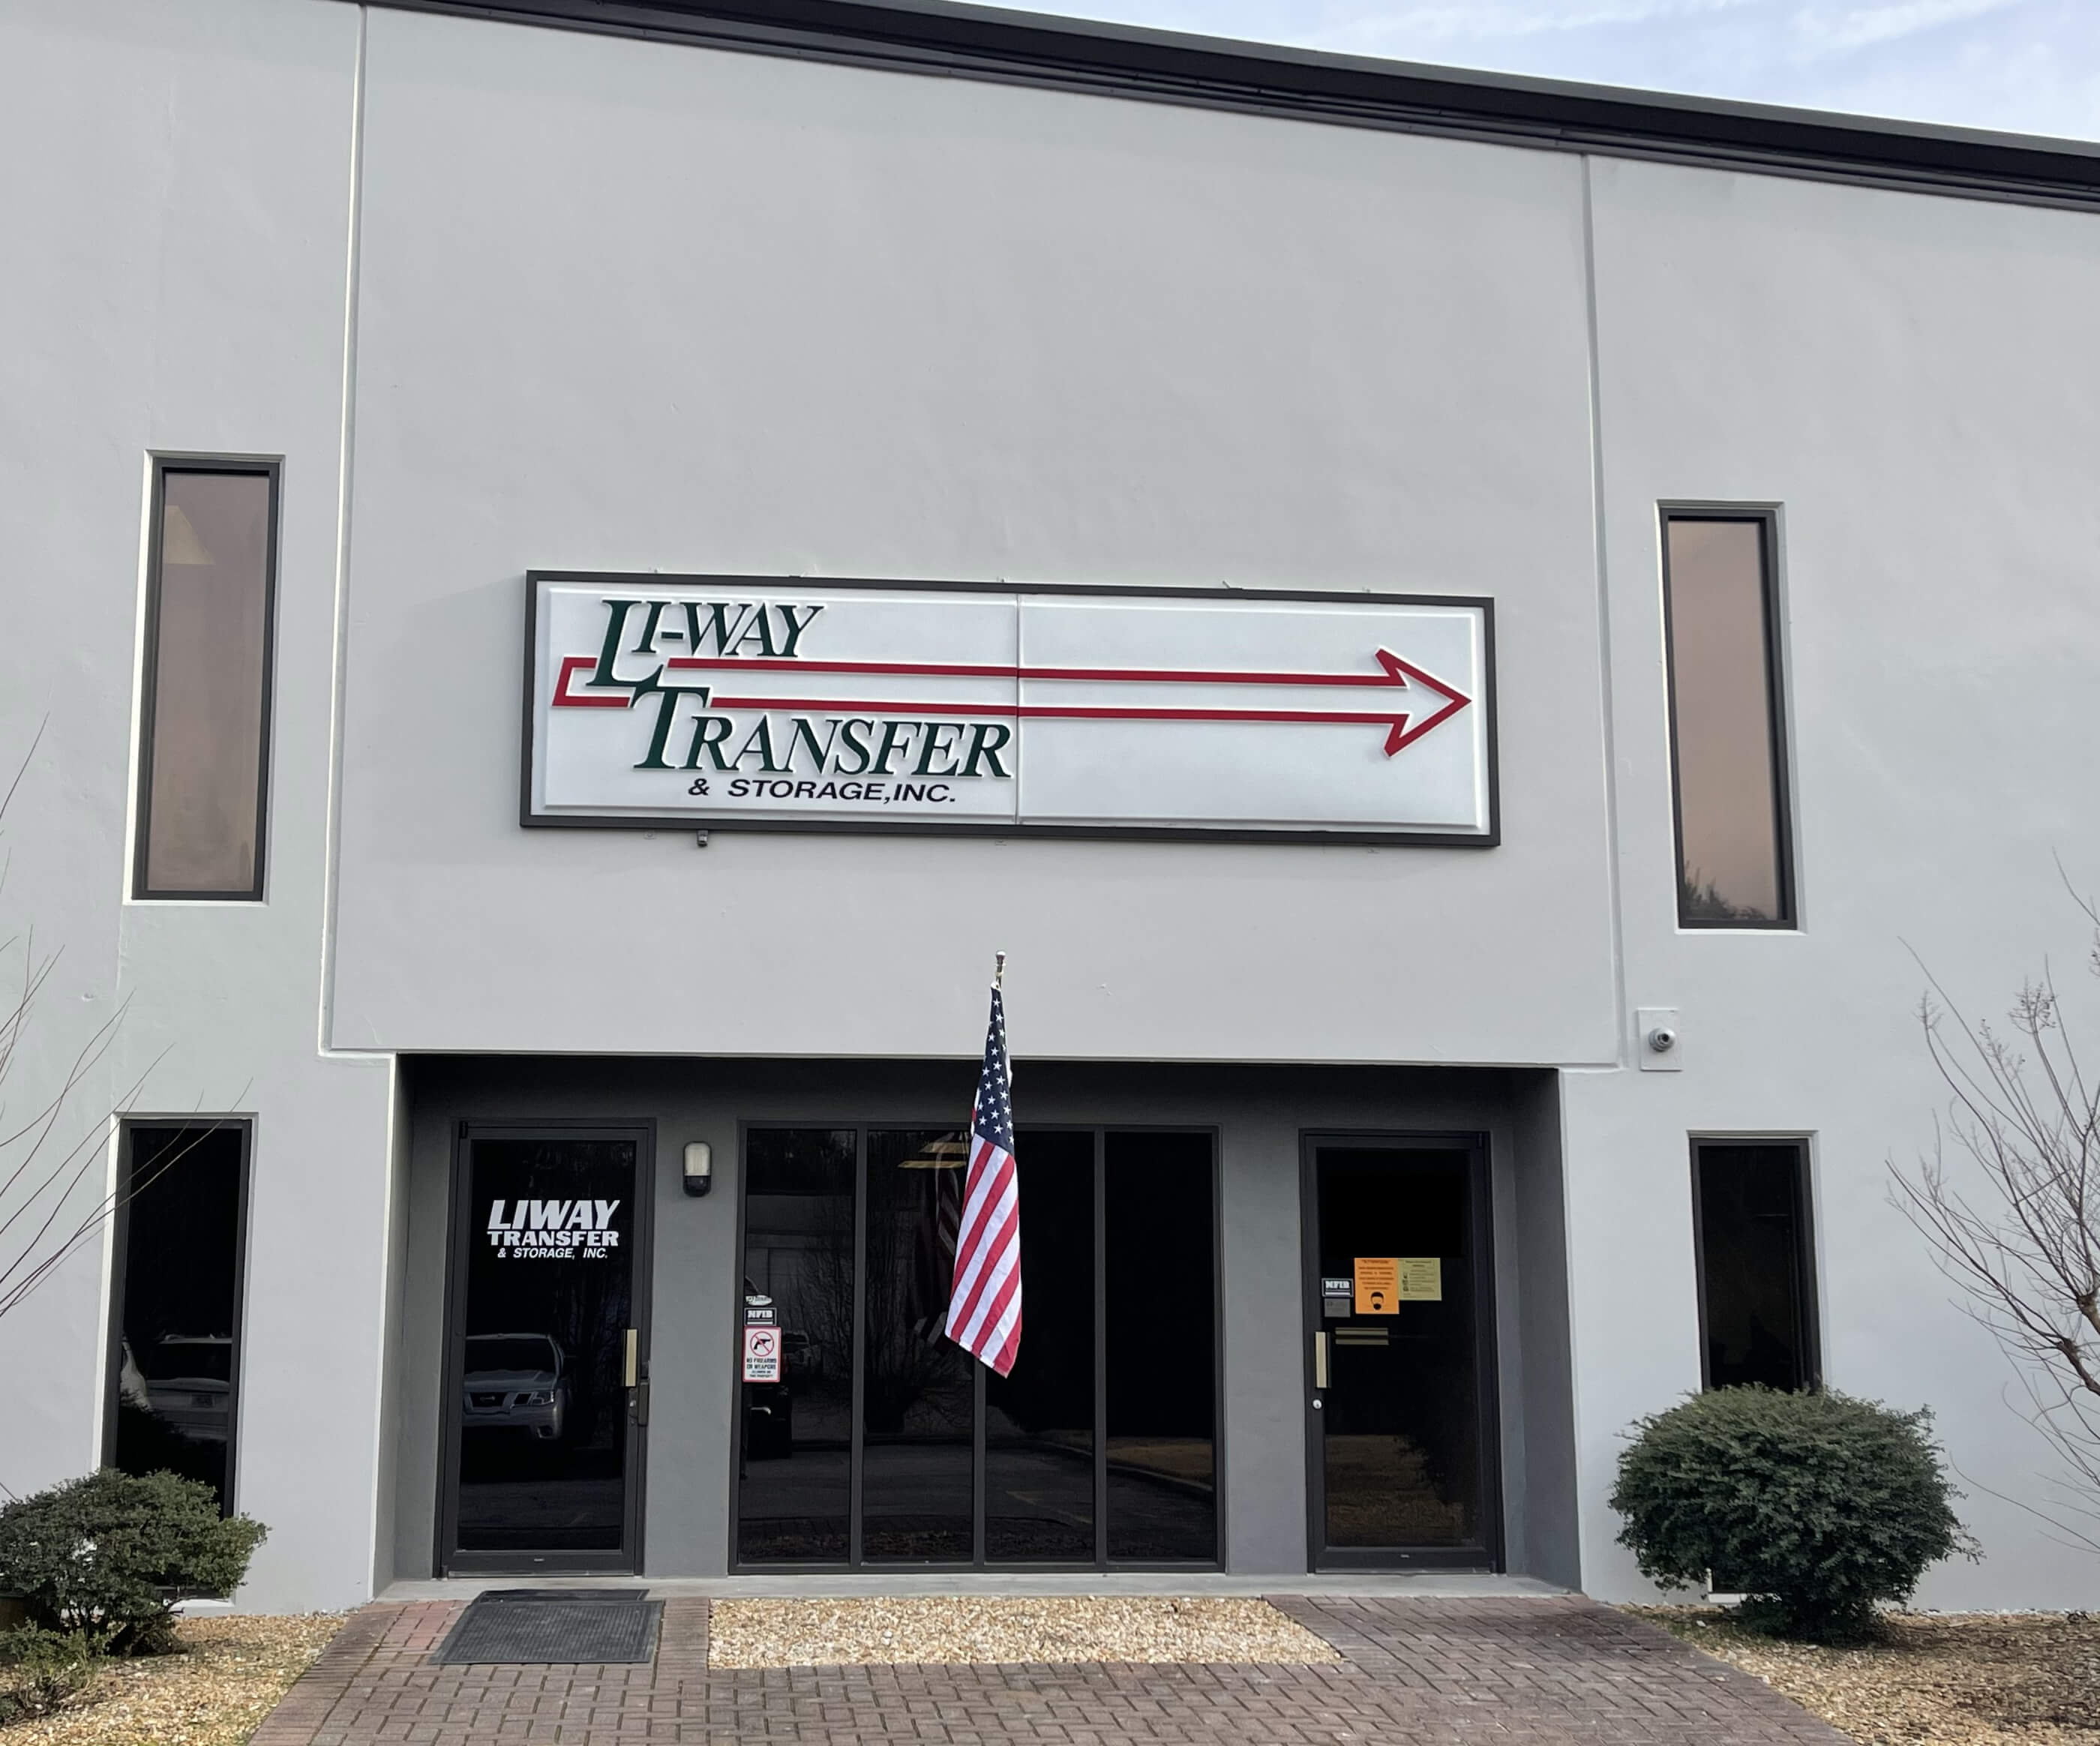 Li-Way Transfer & Storage, Inc Front of Building